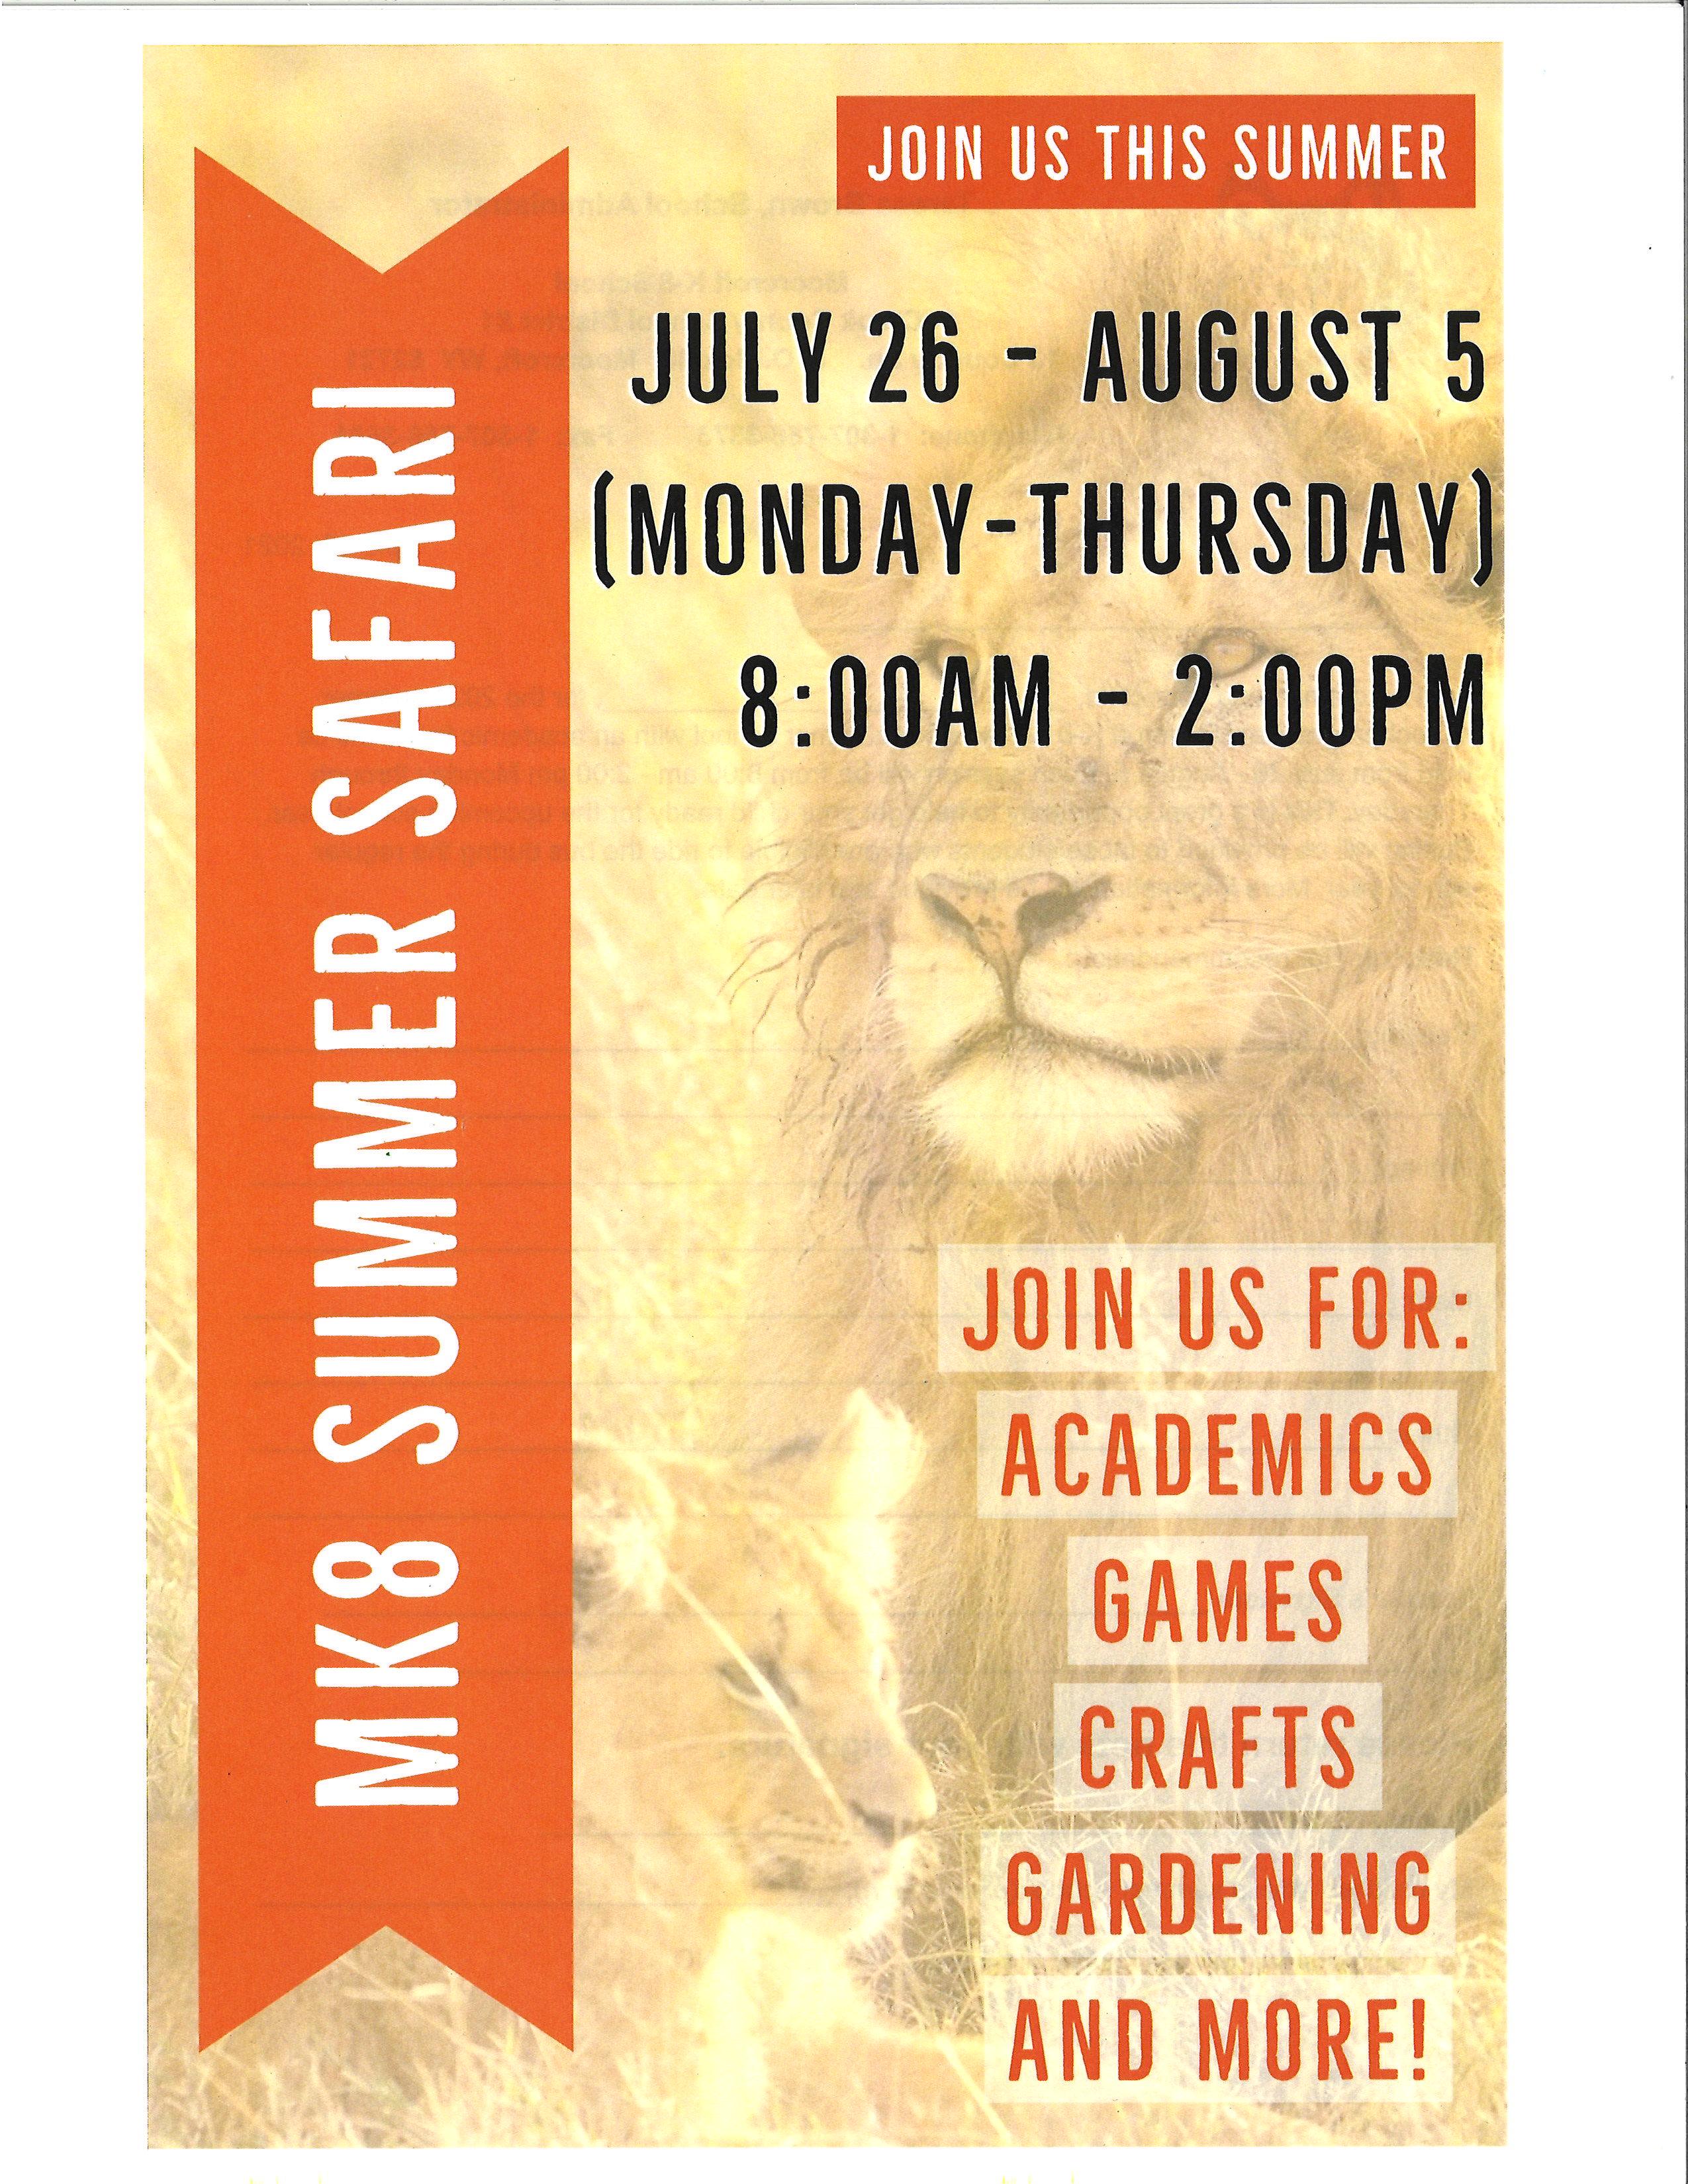 Summer School Safari July 26 - August 5 Open to all students K-8https://docs.google.com/forms/d/e/1FAIpQLSeeT6VrRoxsHzCI_Lf-VS0r9Rjx8SU-MDP8TFGmfPcKLy1Ipw/viewform